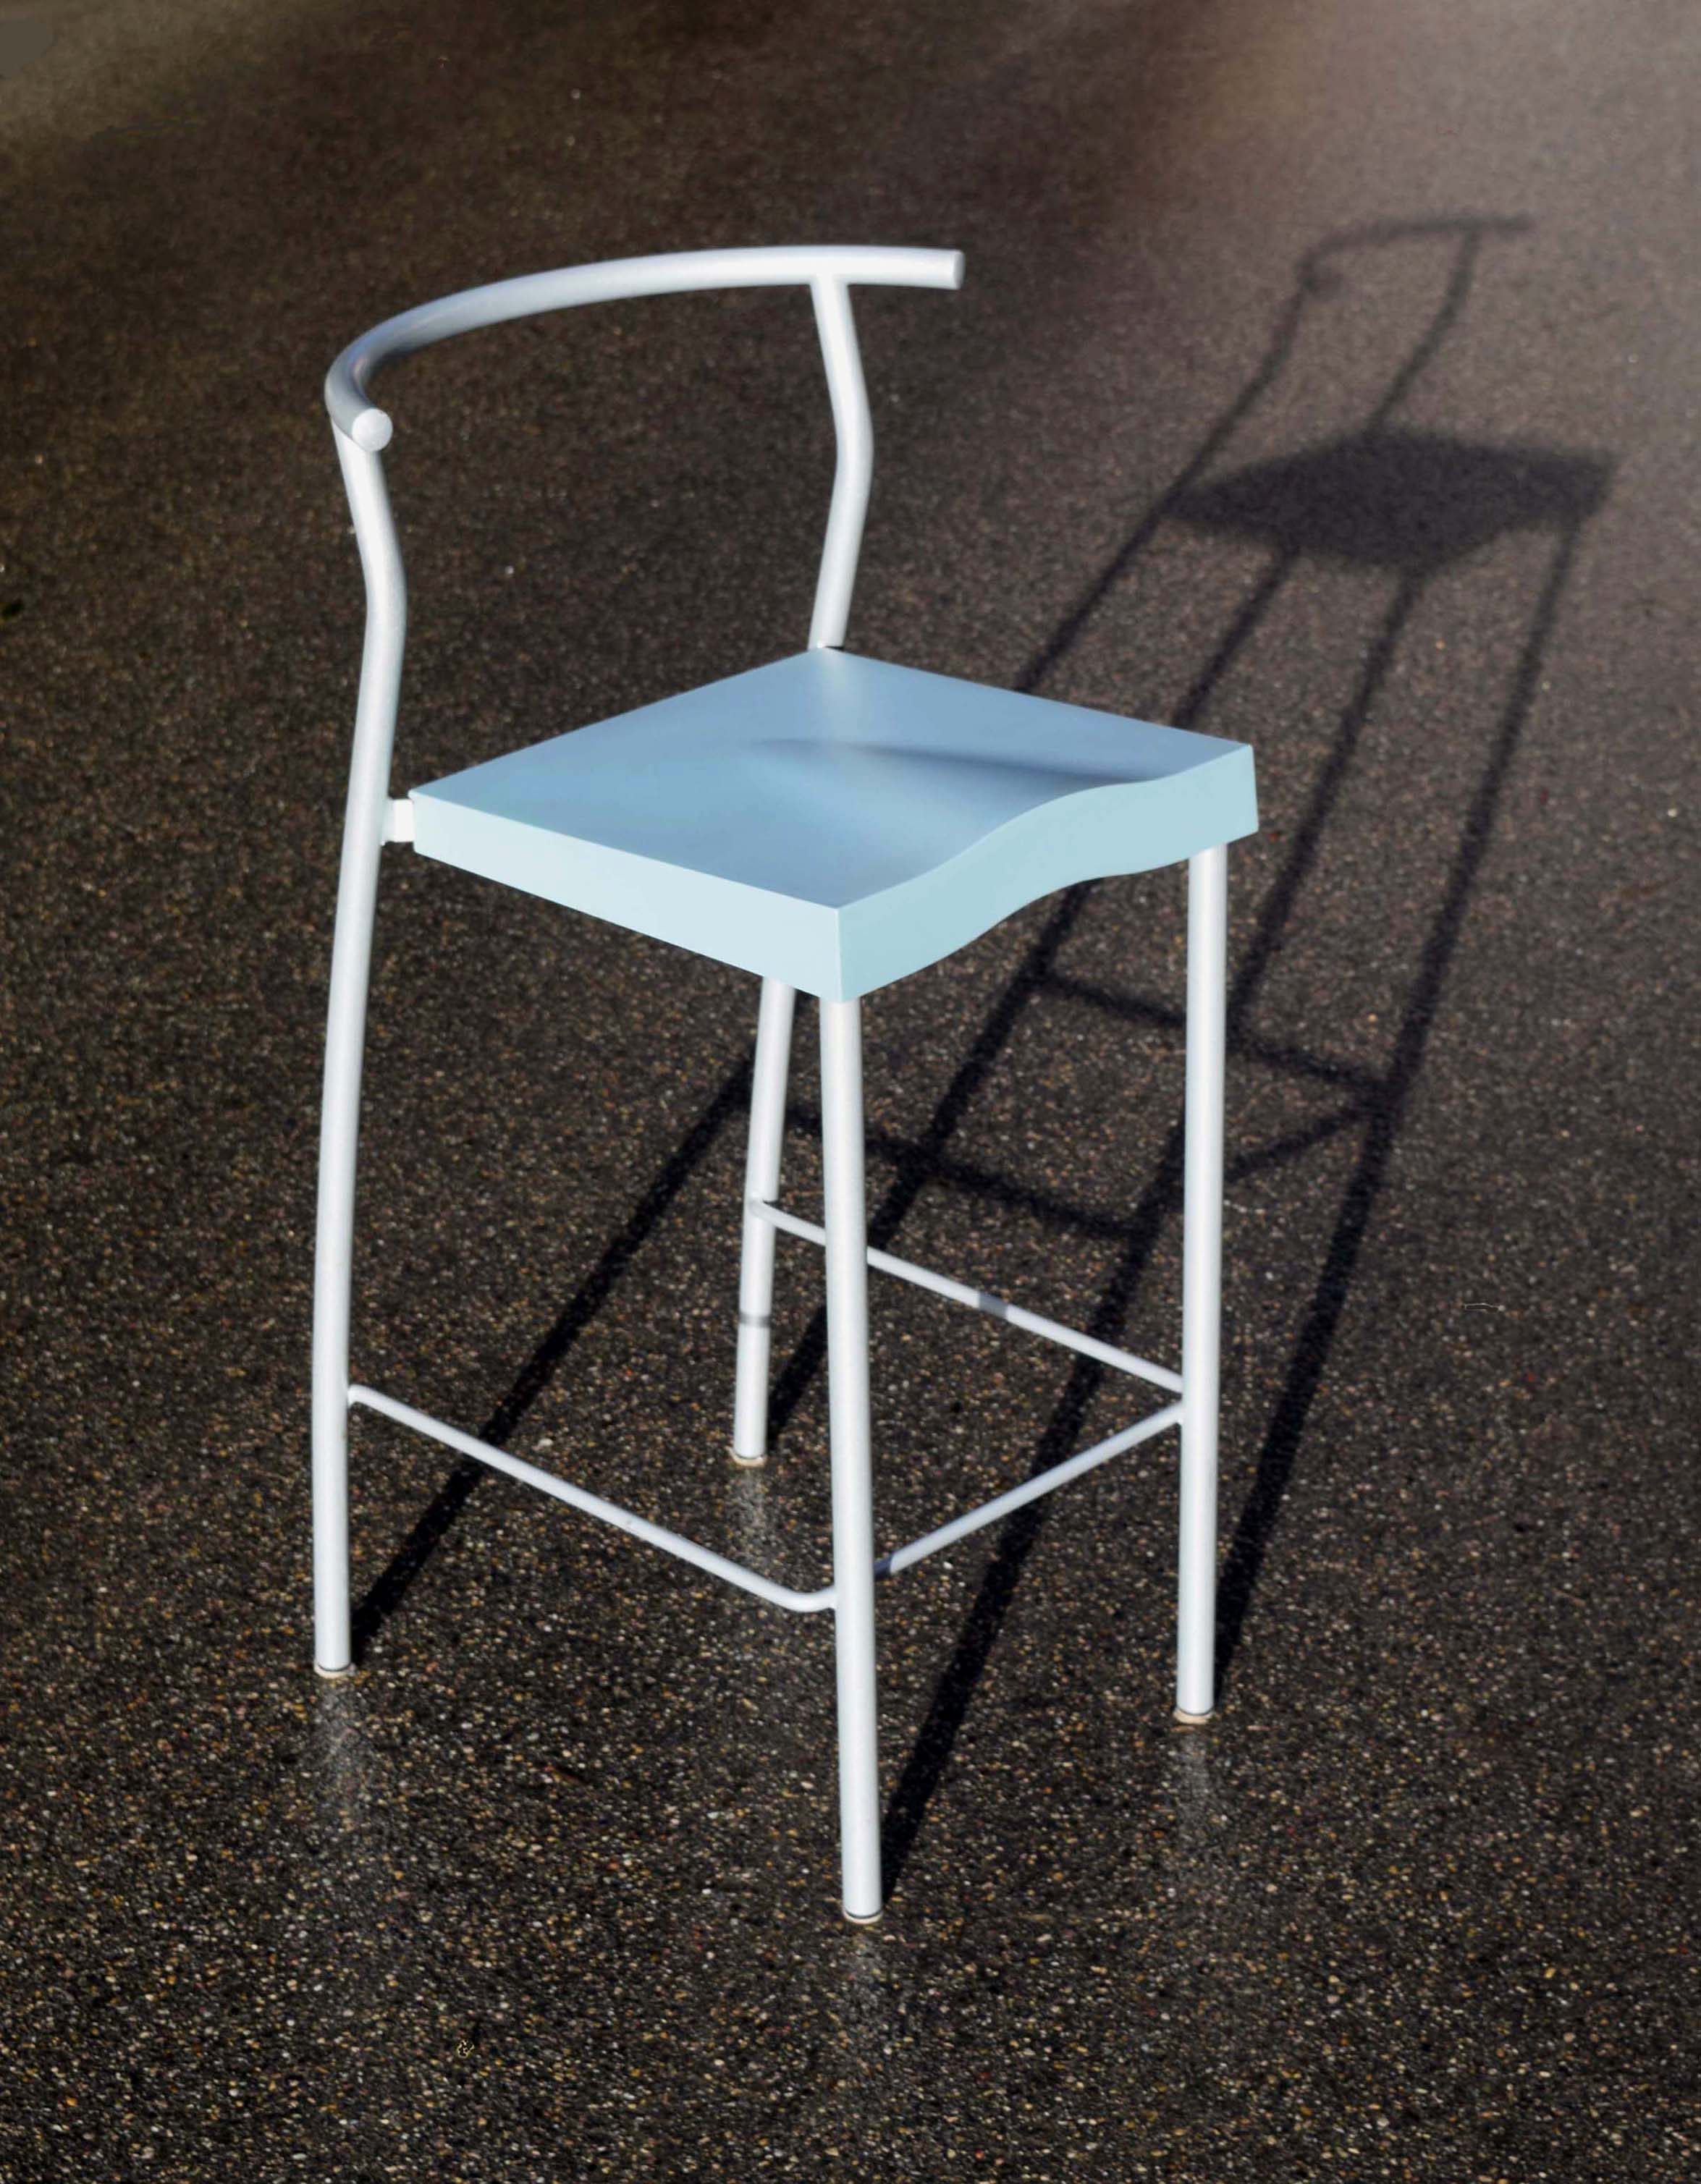 Objets et mobilier design vintage 80s for Chaise xo starck